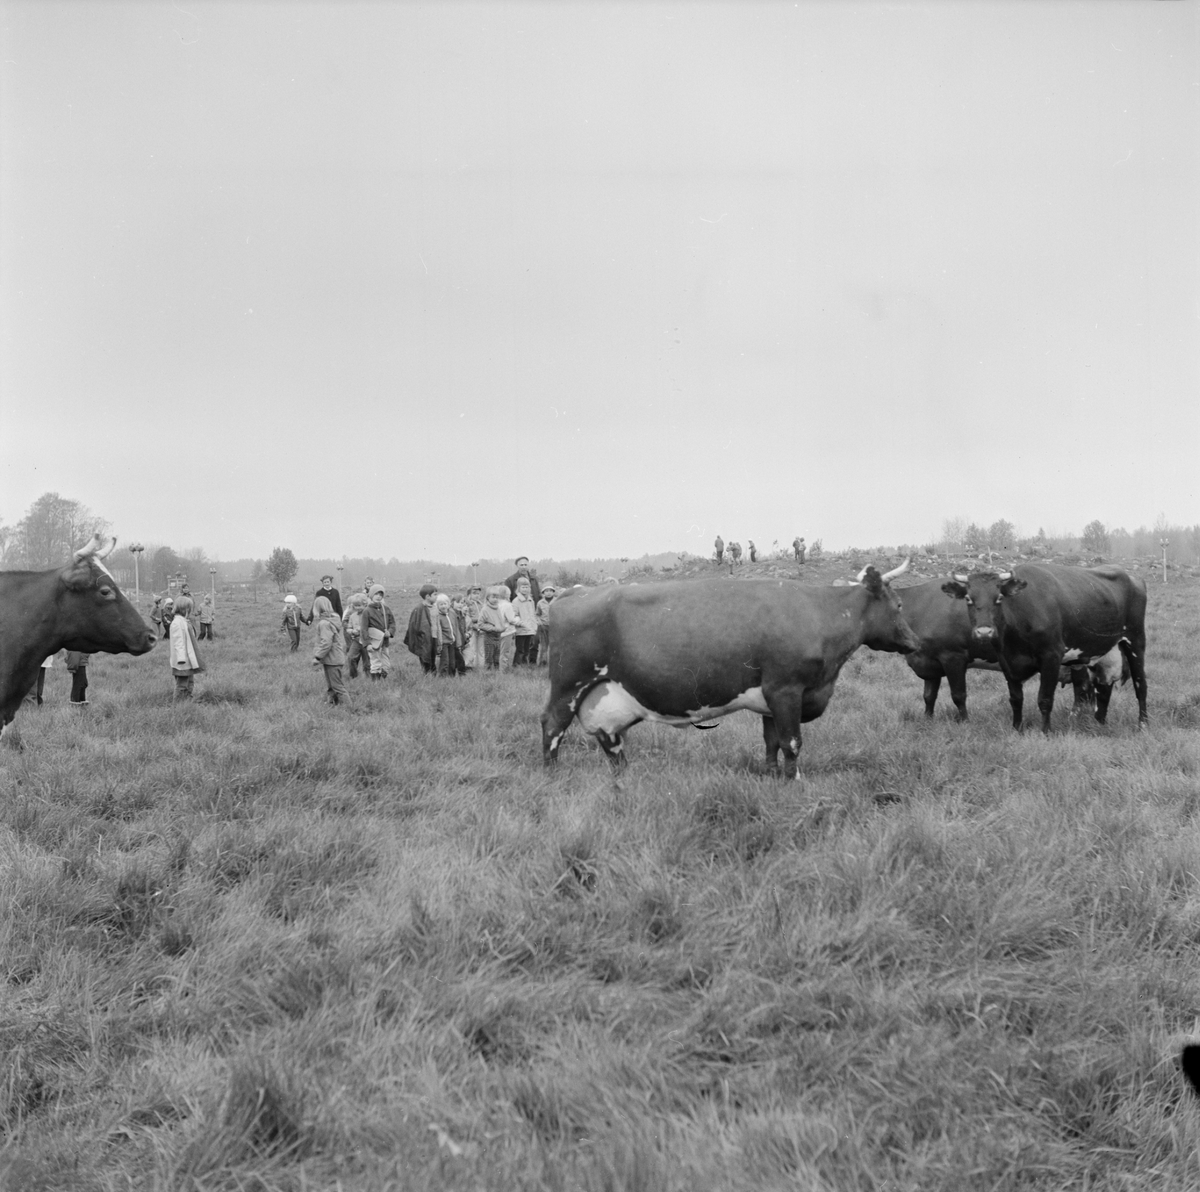 Elever bland kor på bete, Söderfors, Uppland, juni 1972